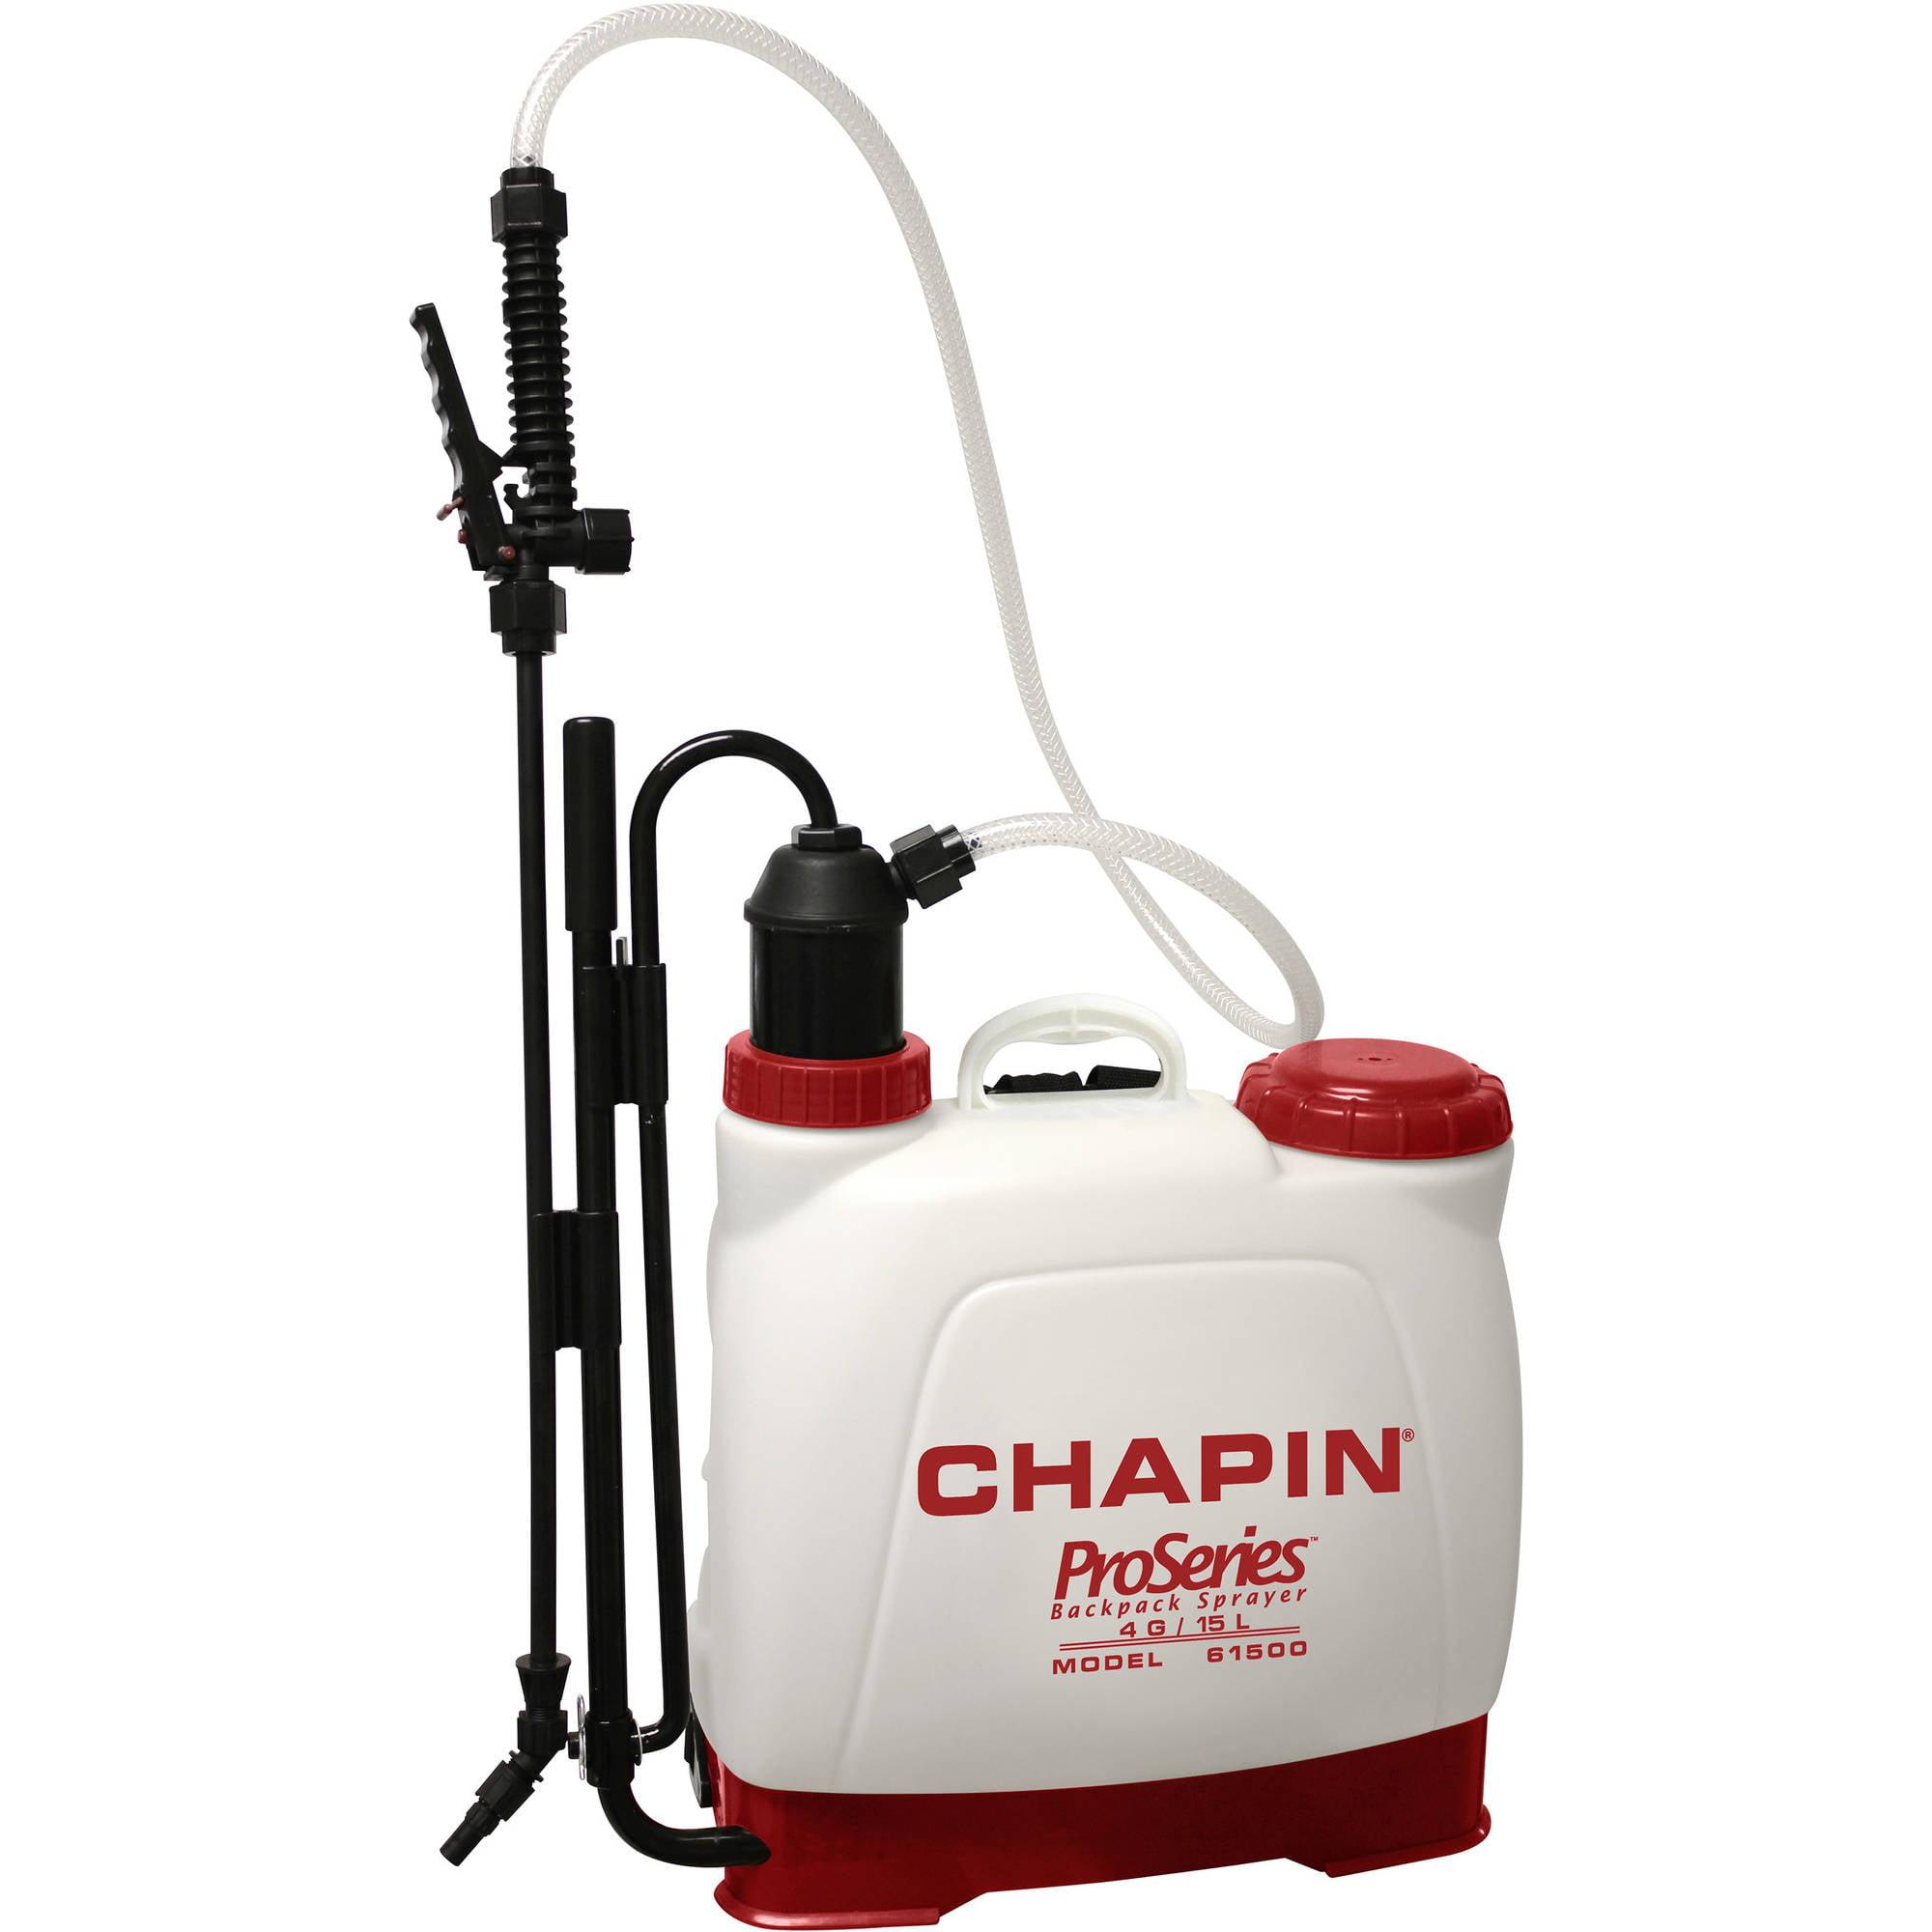 Chapin 61500 4-Gallon Euro Style Backpack Sprayer